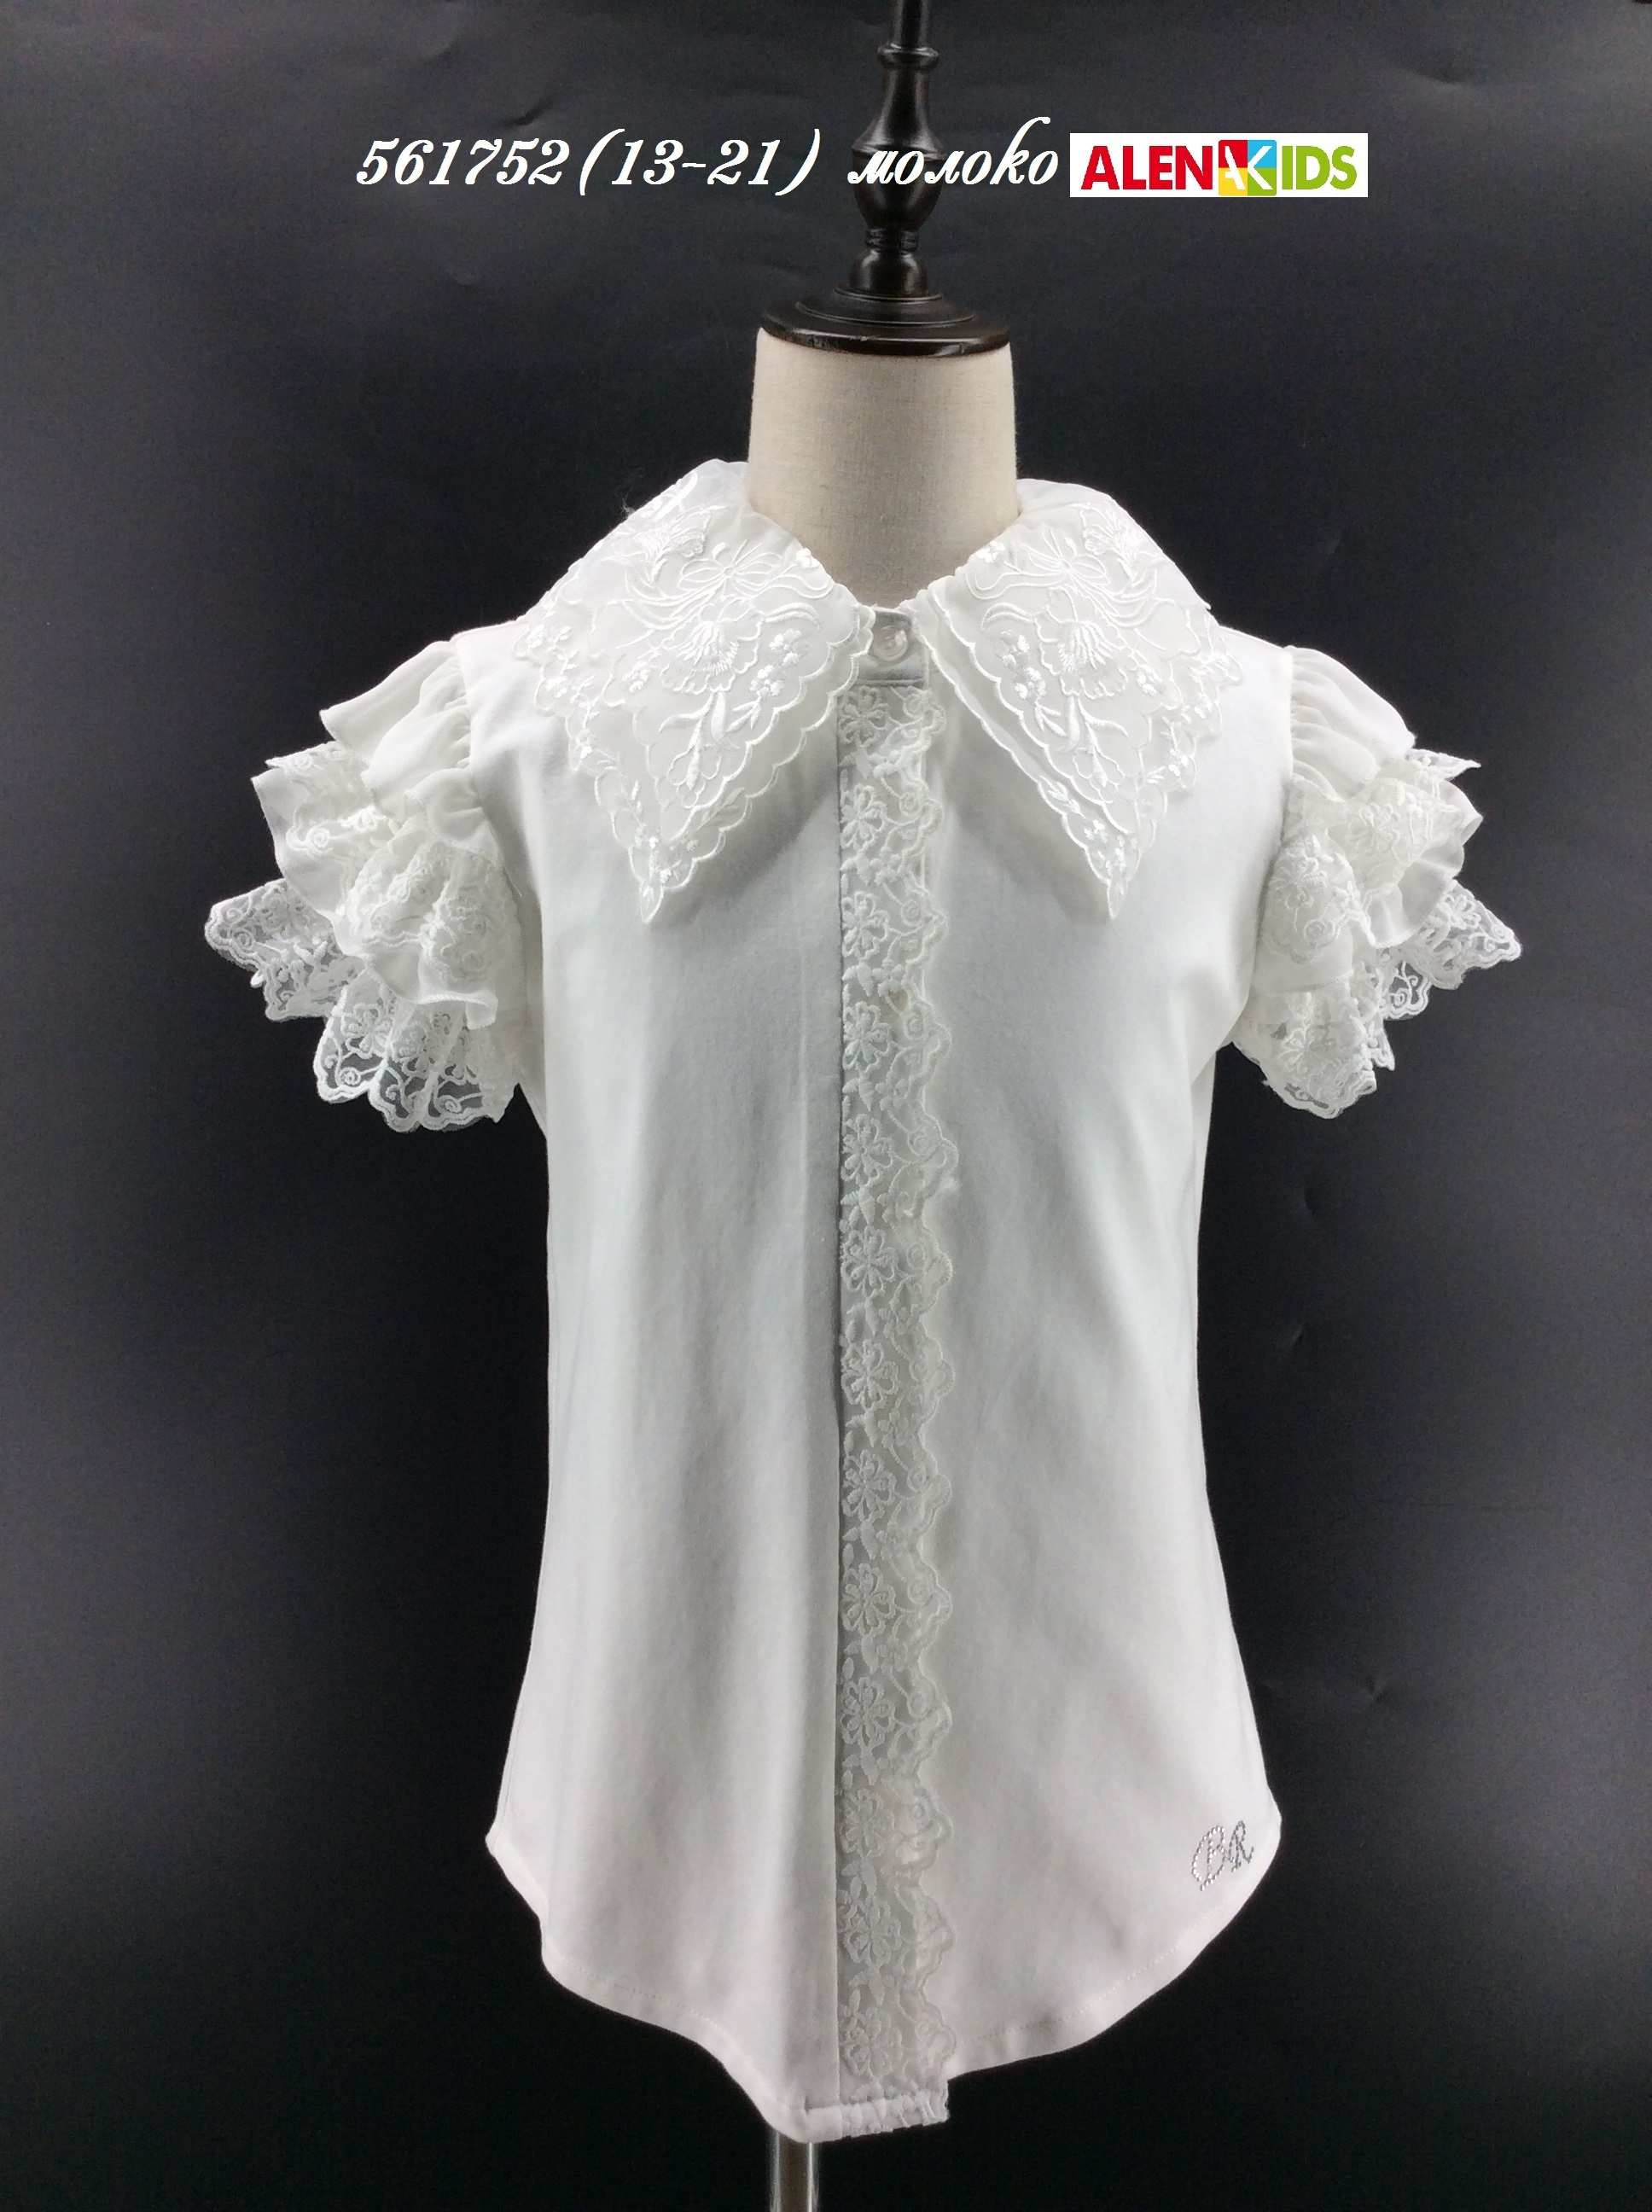 Блузка для девочки YGBH561752